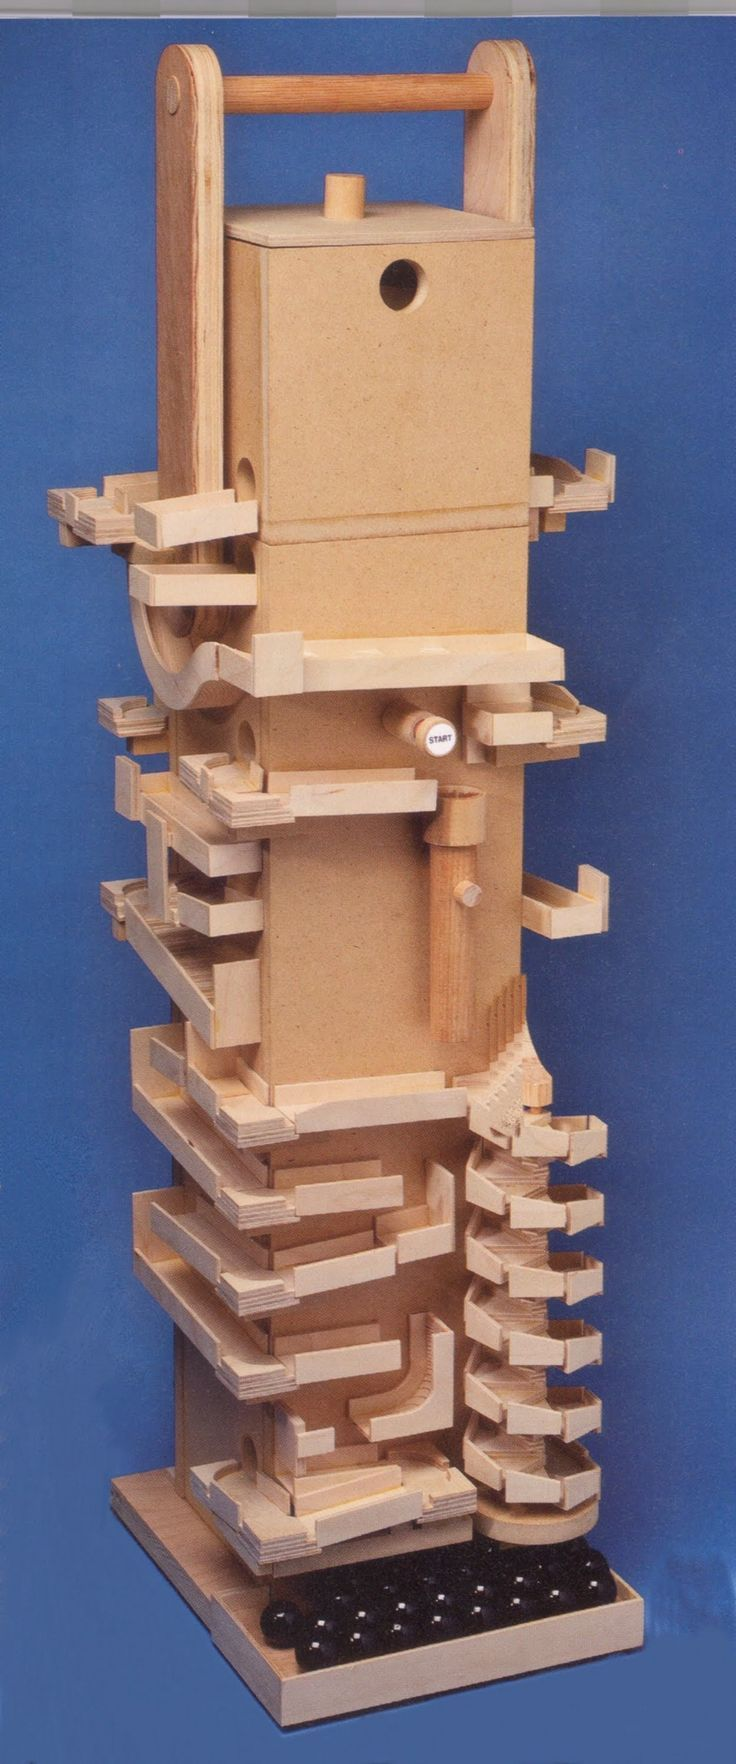 Marble Machine 4 Woodworking Diy Marble Machine